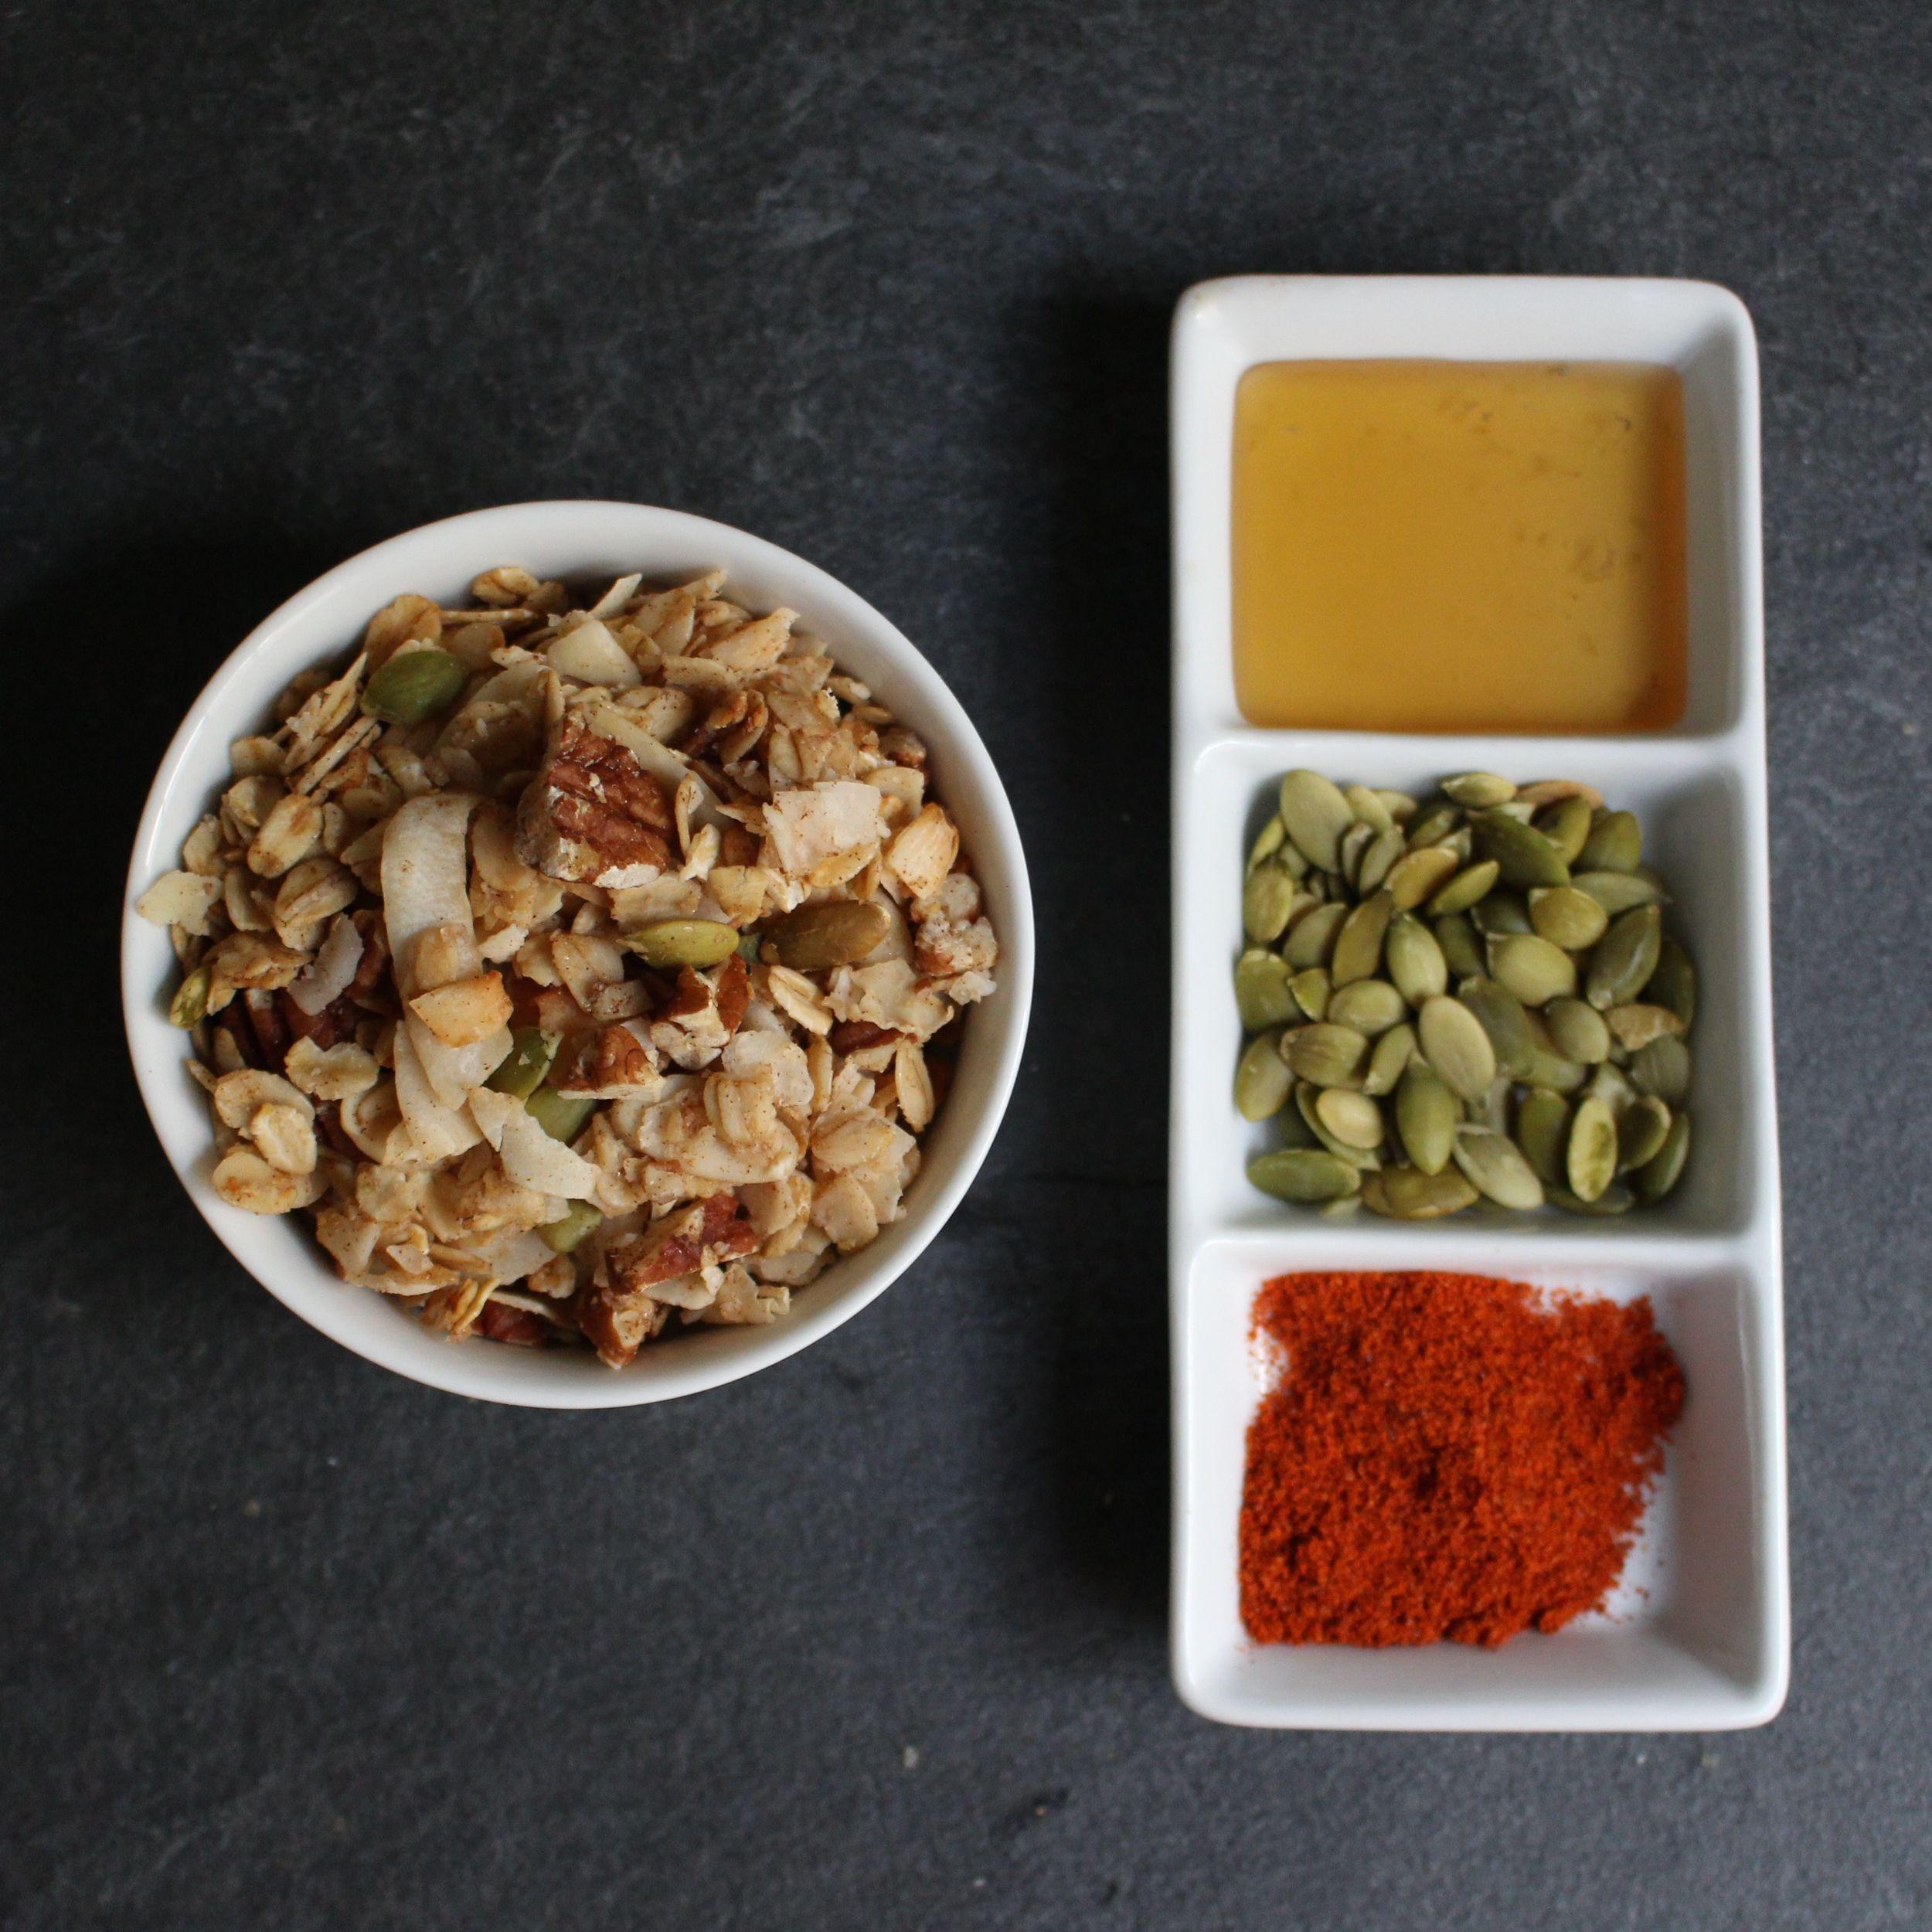 Maple, pepitas and cayenne spice up basic granola